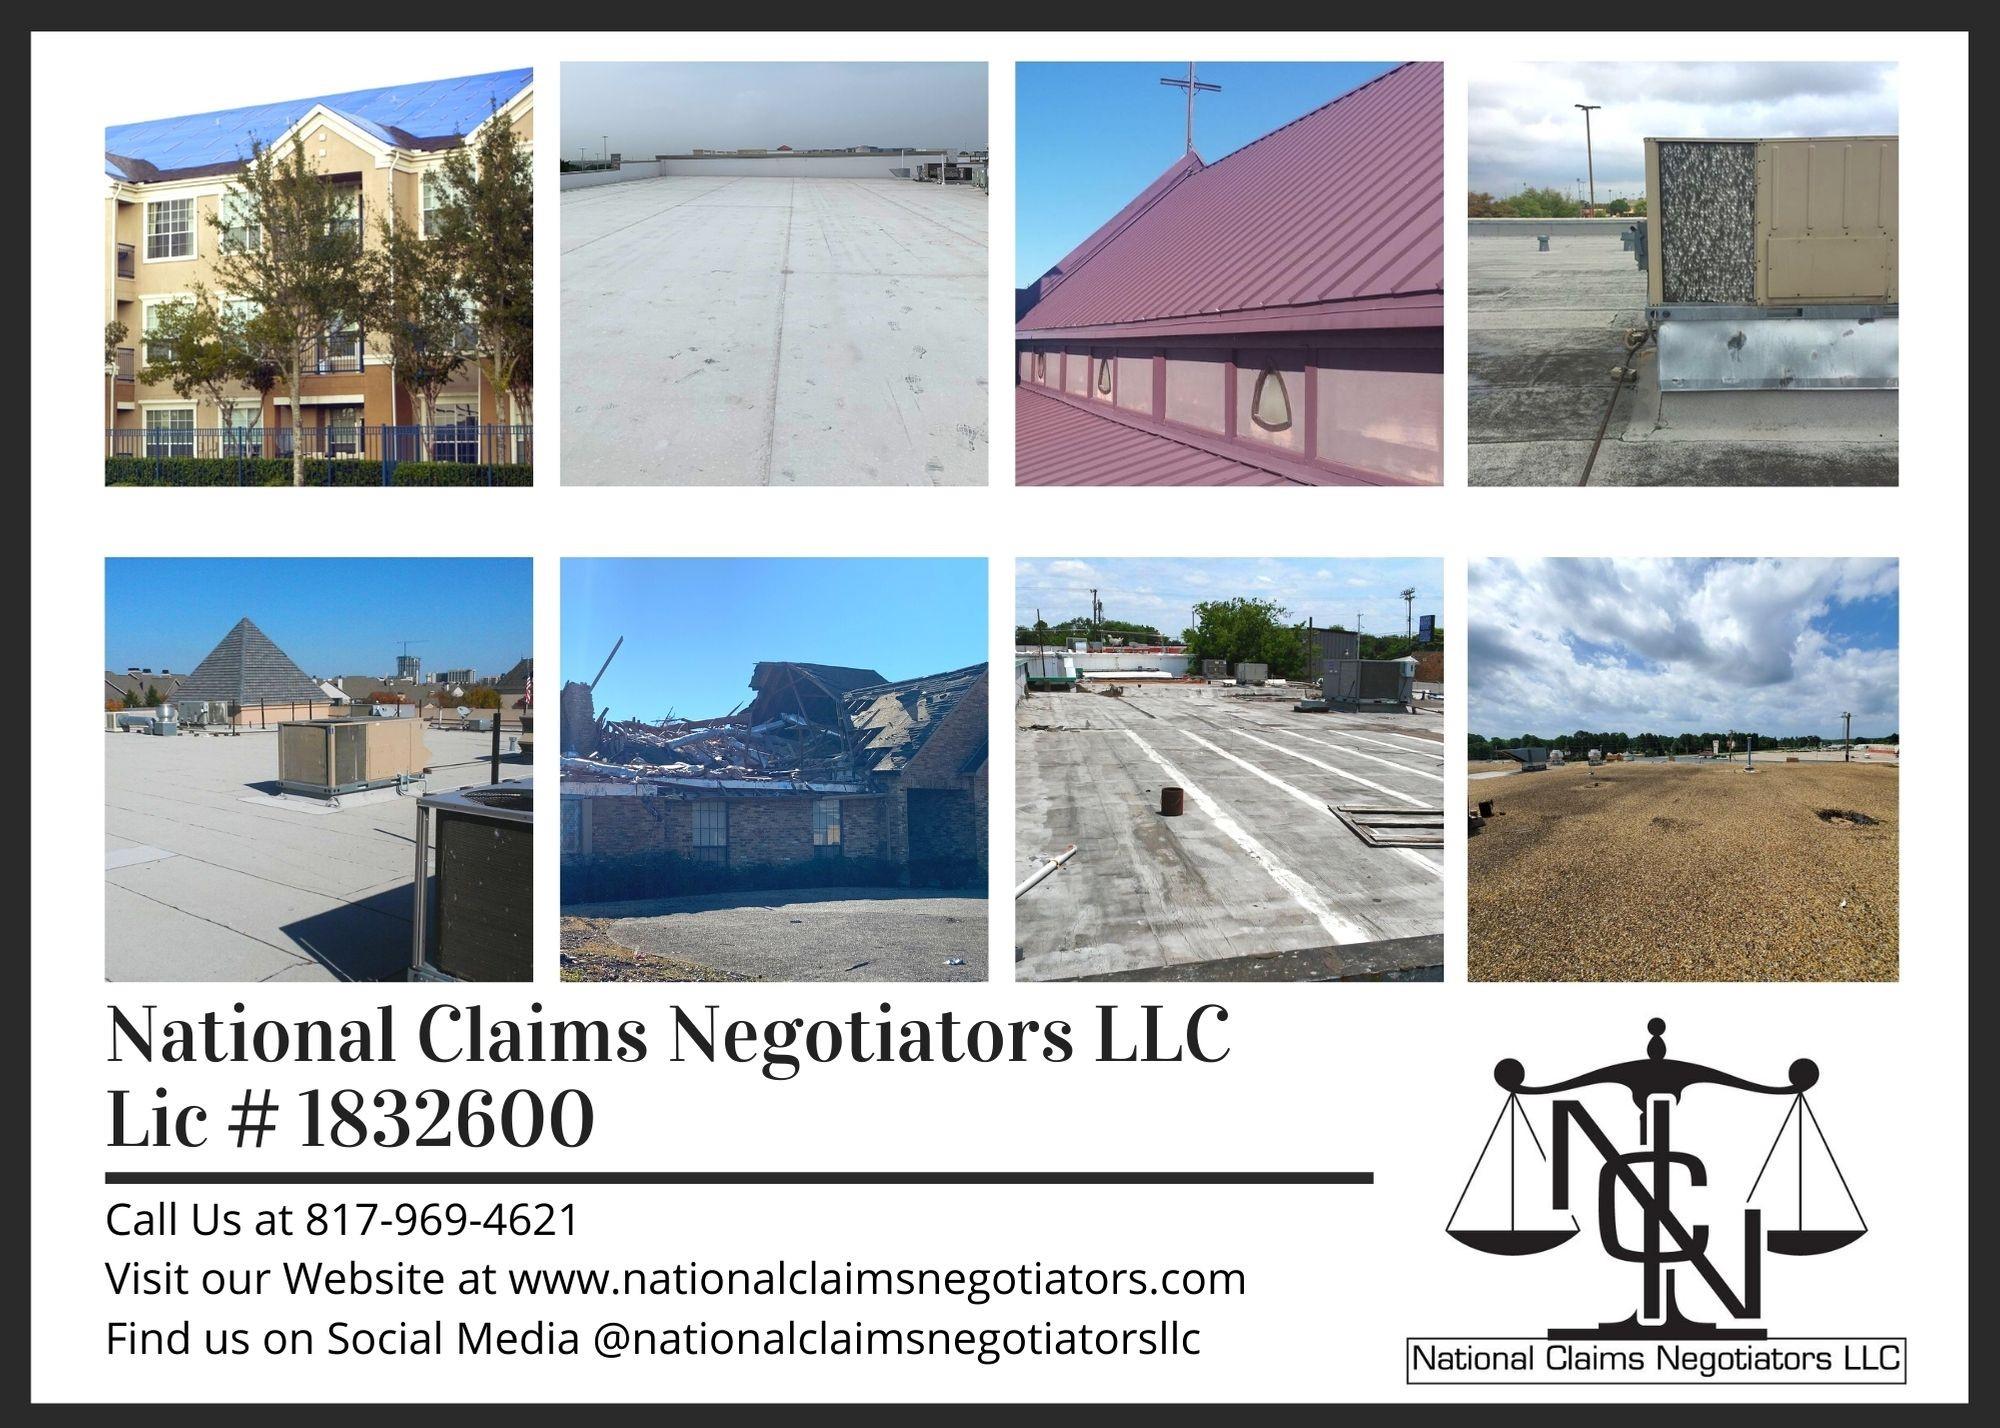 National Claims Negotiators LLC reviews   Public Adjusters at 2300 Matlock Road - Mansfield TX